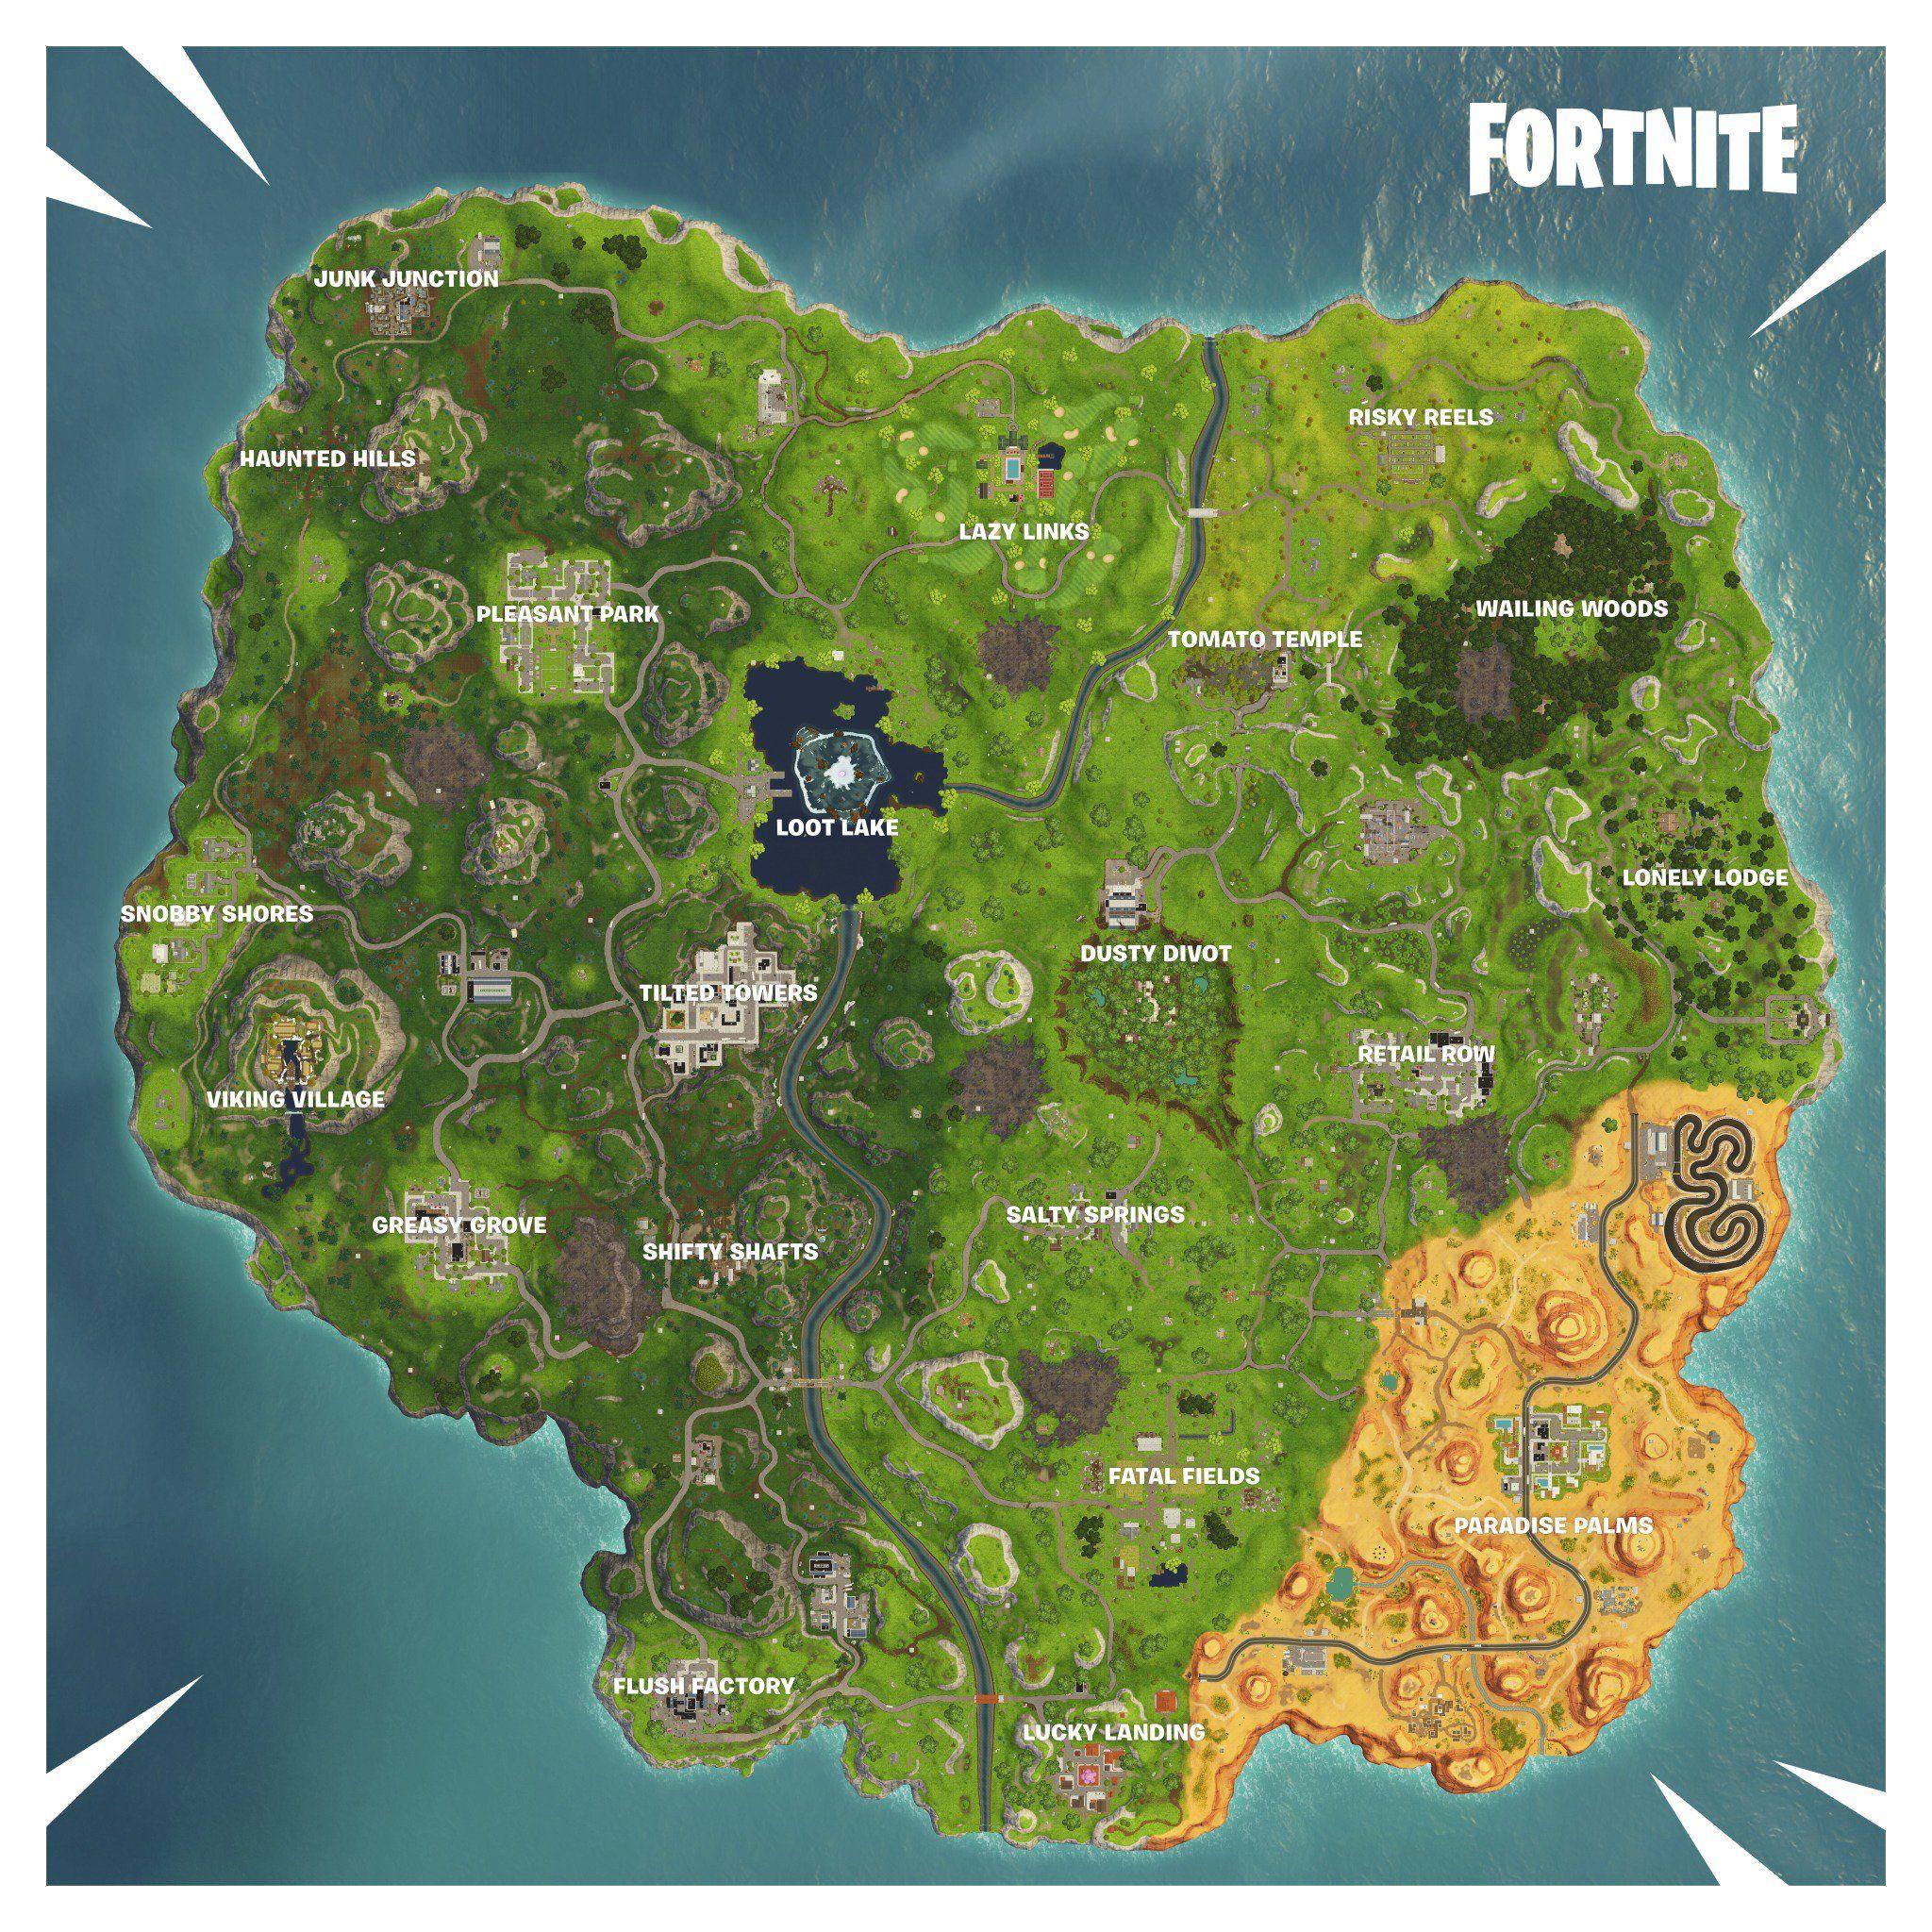 fortnite season 6 map - fortnite xbox safe zone setting